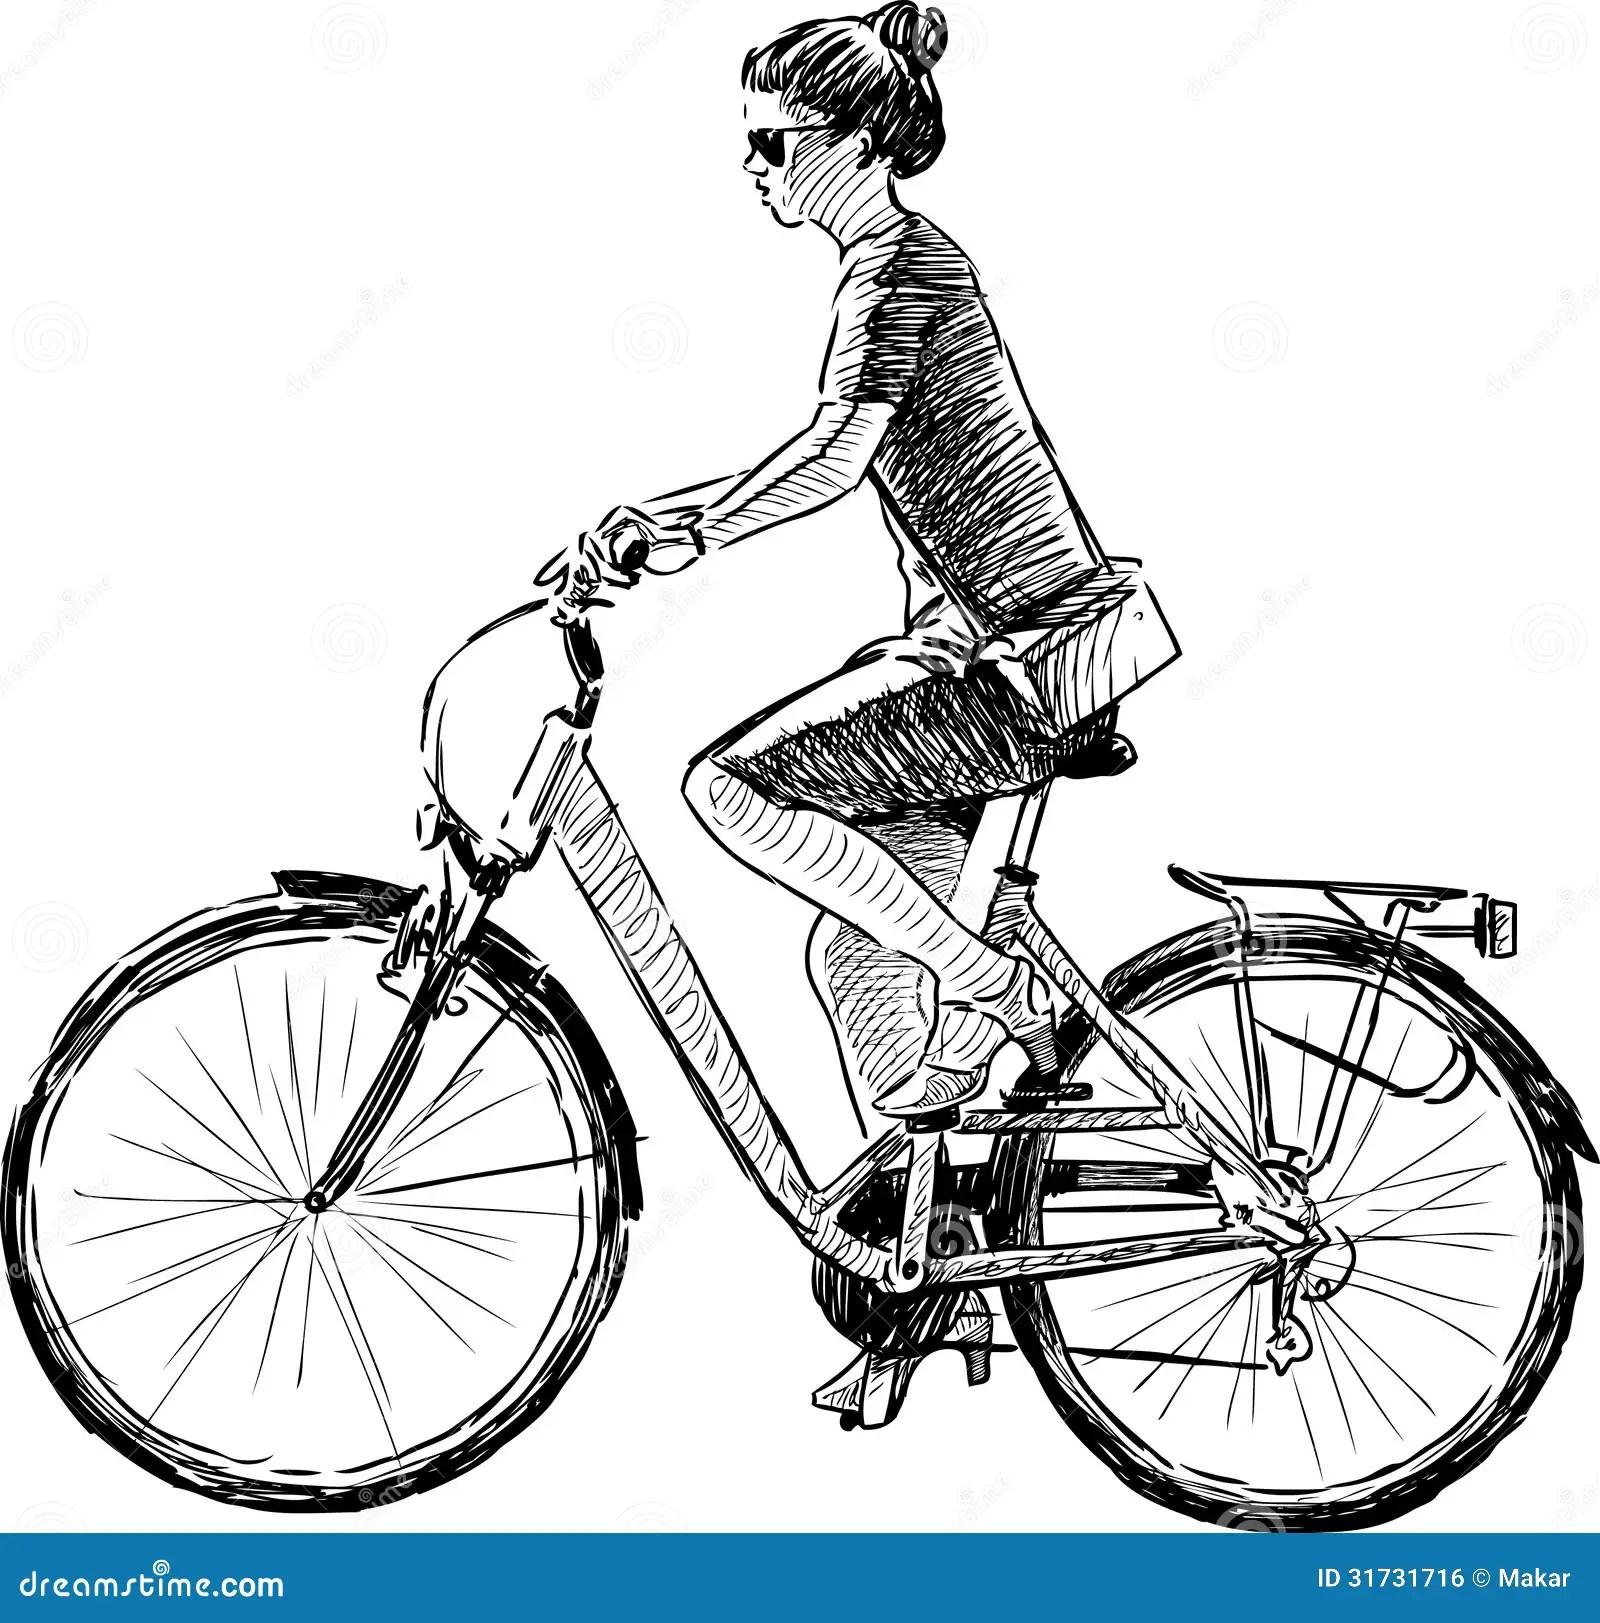 Girl riding a bike stock vector. Illustration of